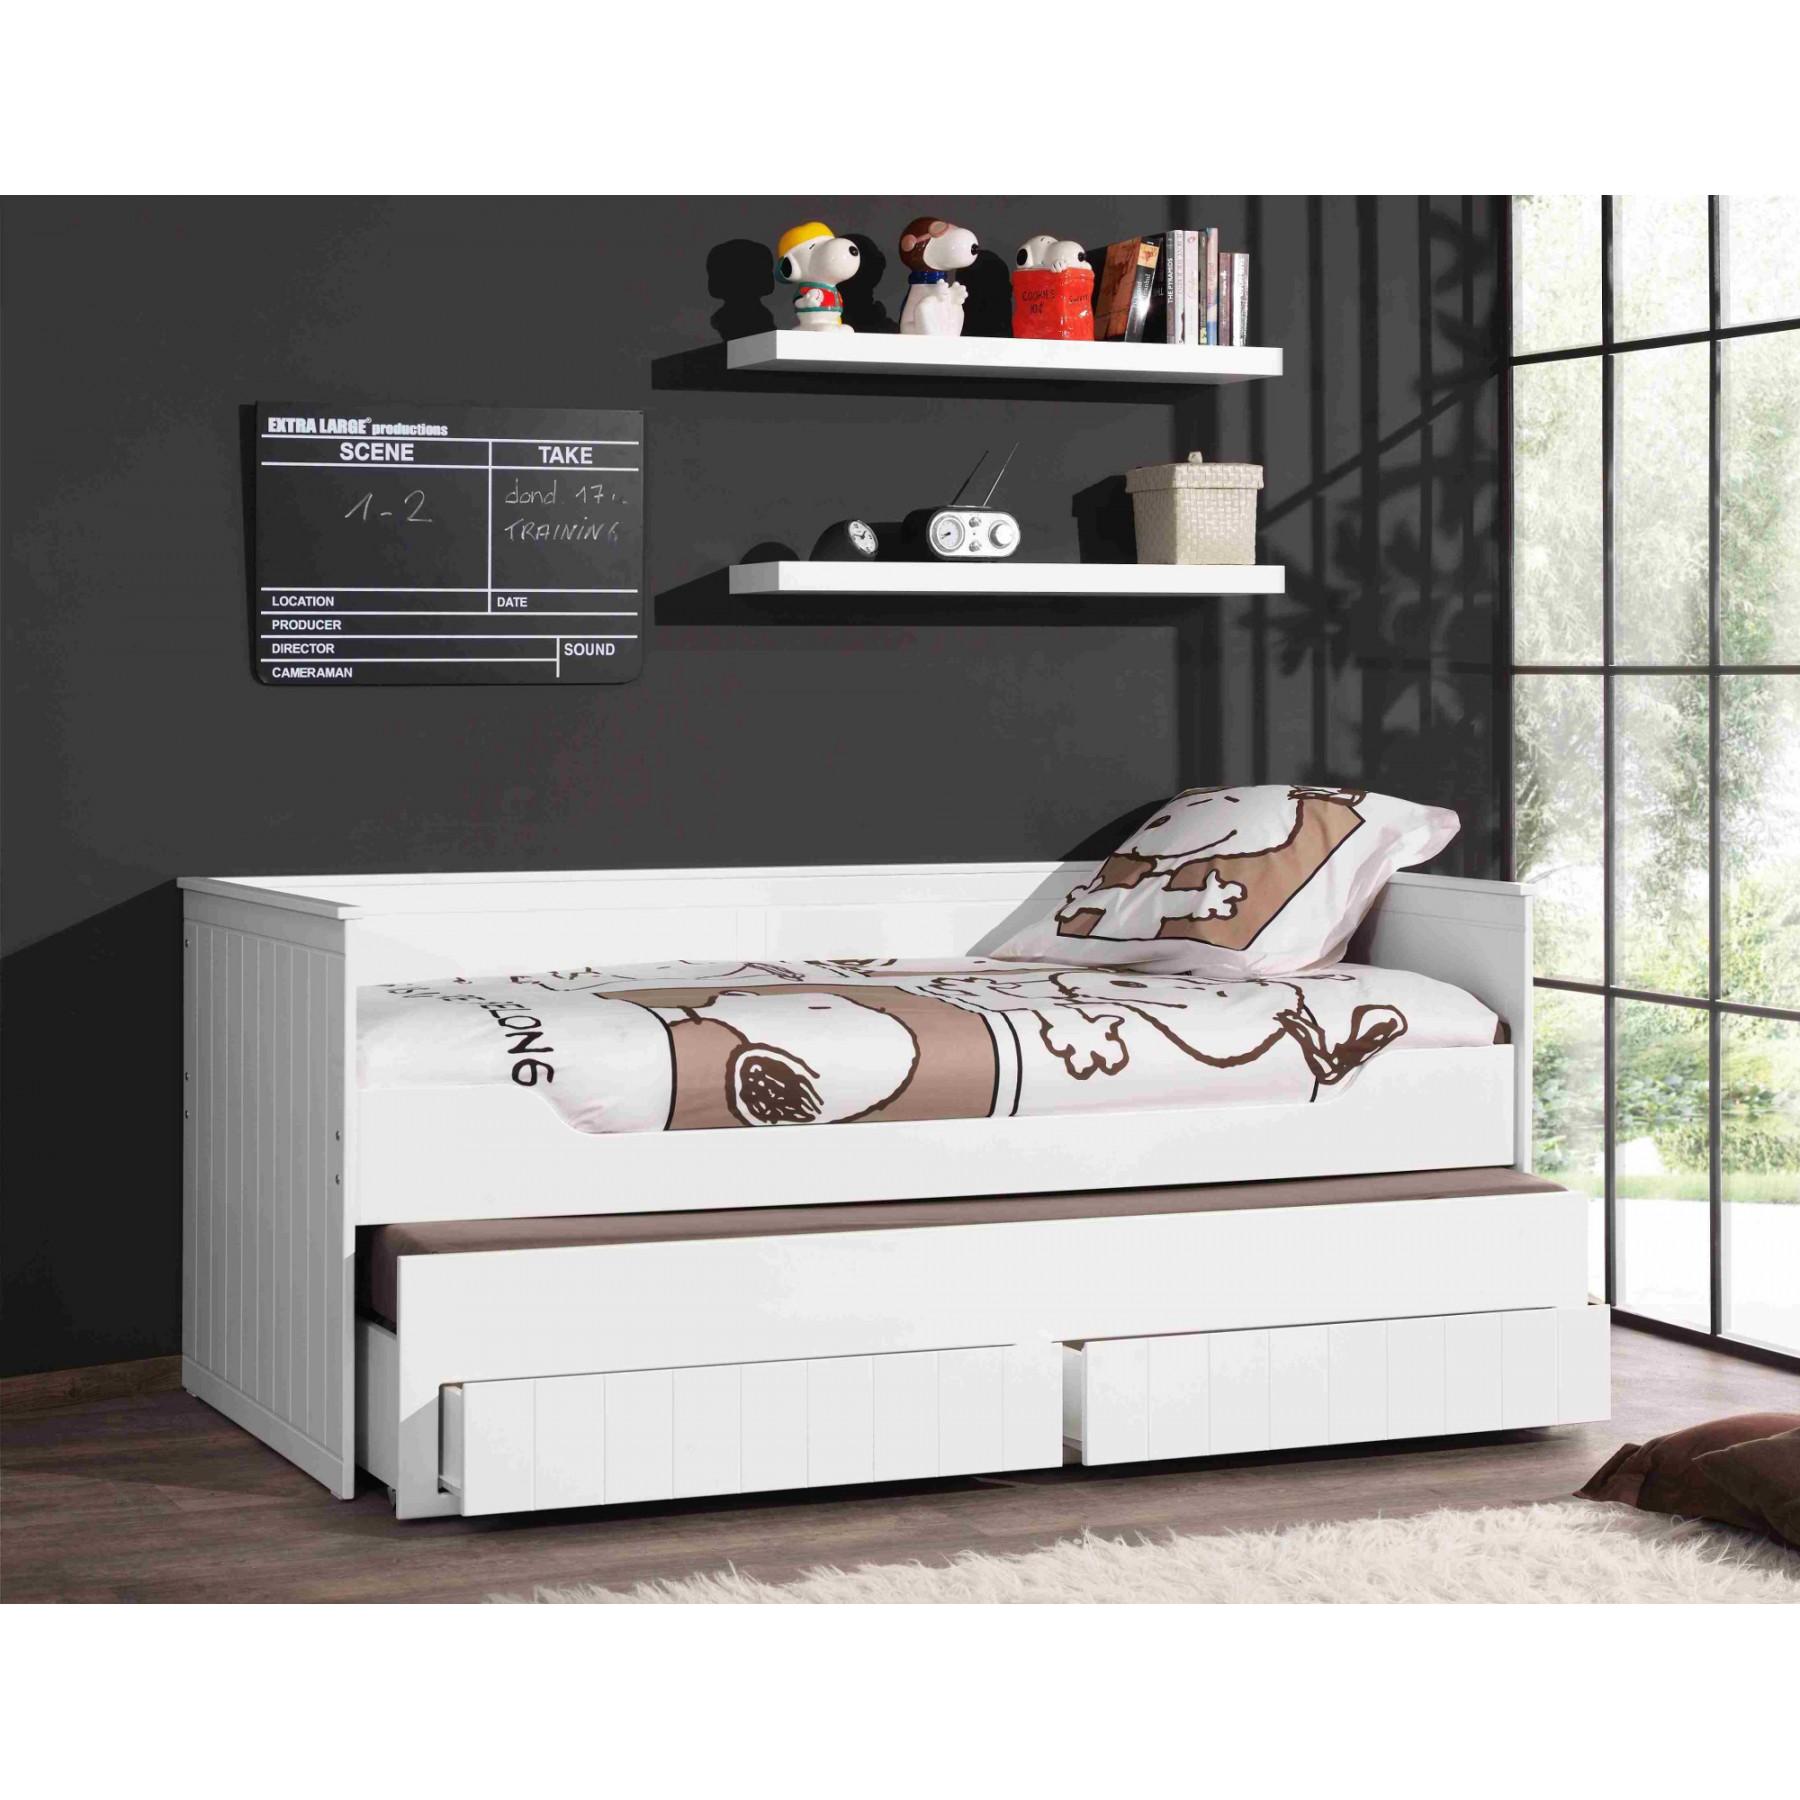 lit gigogne laque blanc en mdf et pin massif avec tiroirs